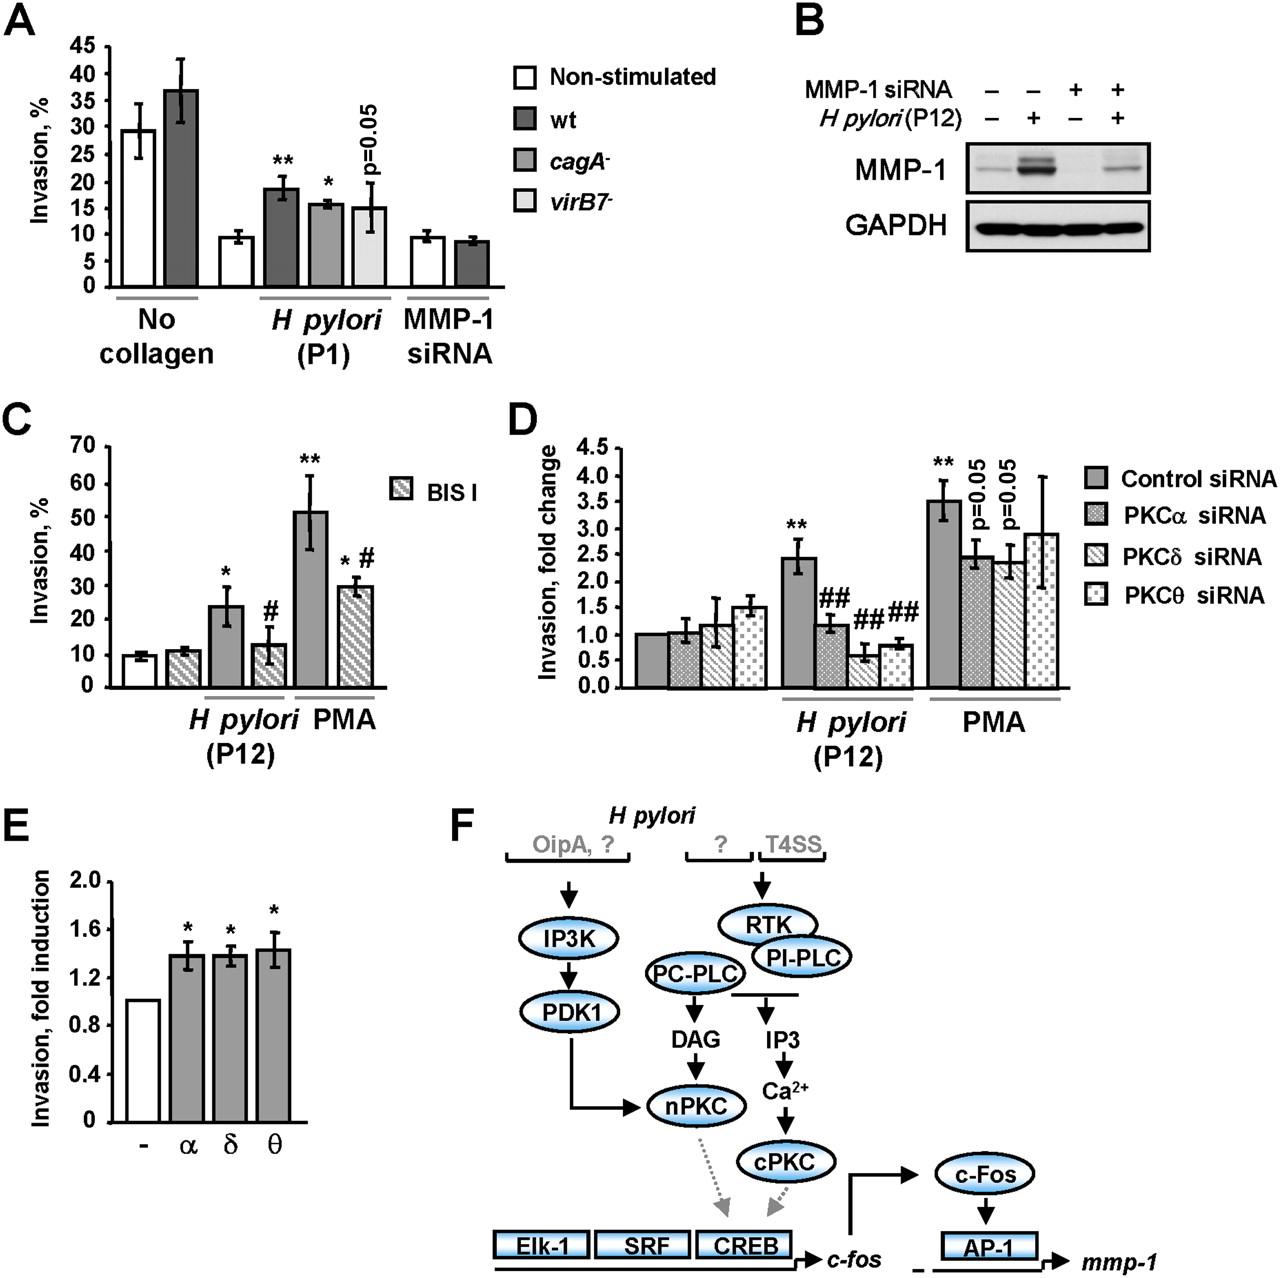 Protein kinase C isozymes regulate matrix